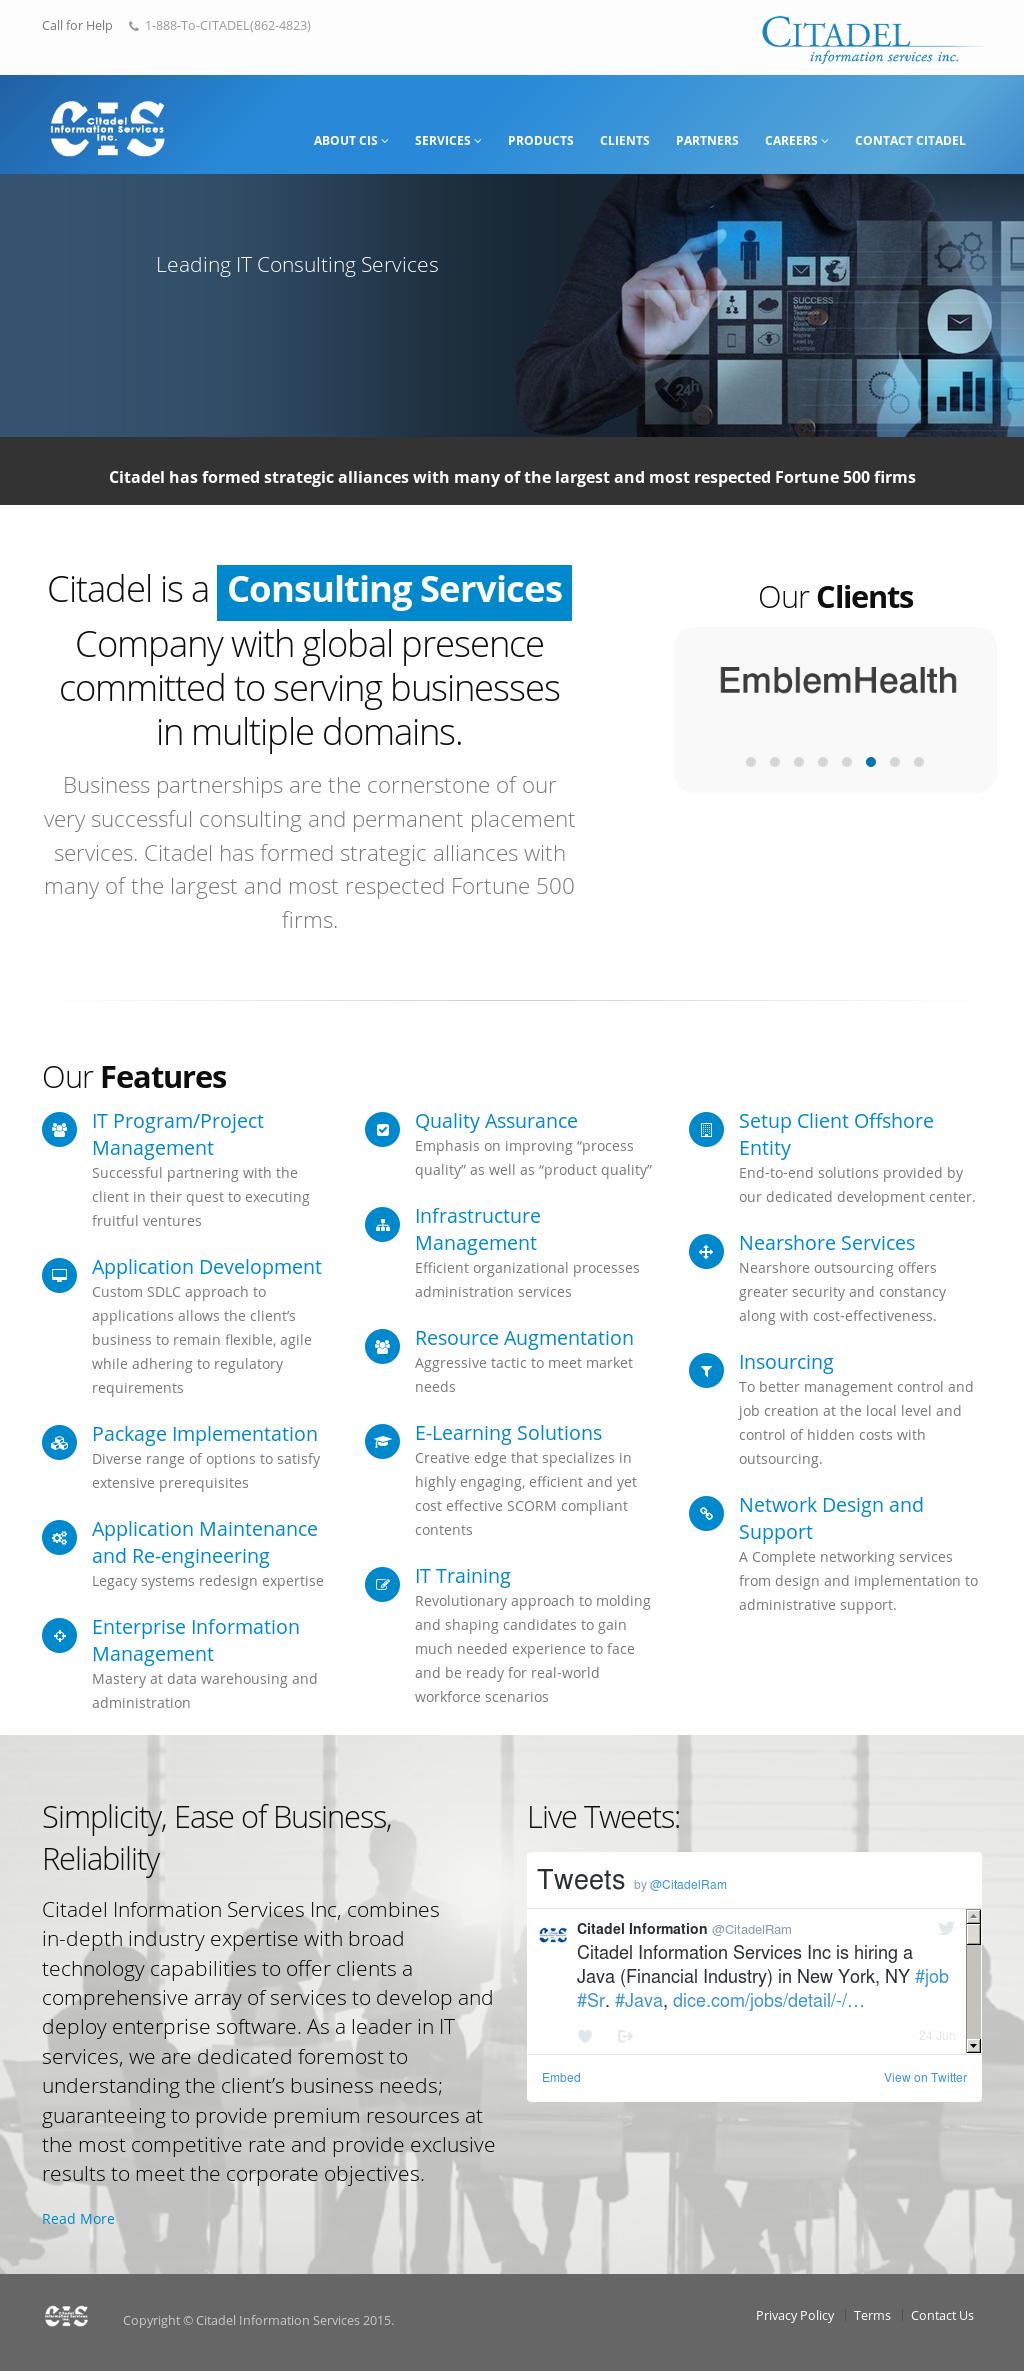 Citadel Information Services Competitors, Revenue and